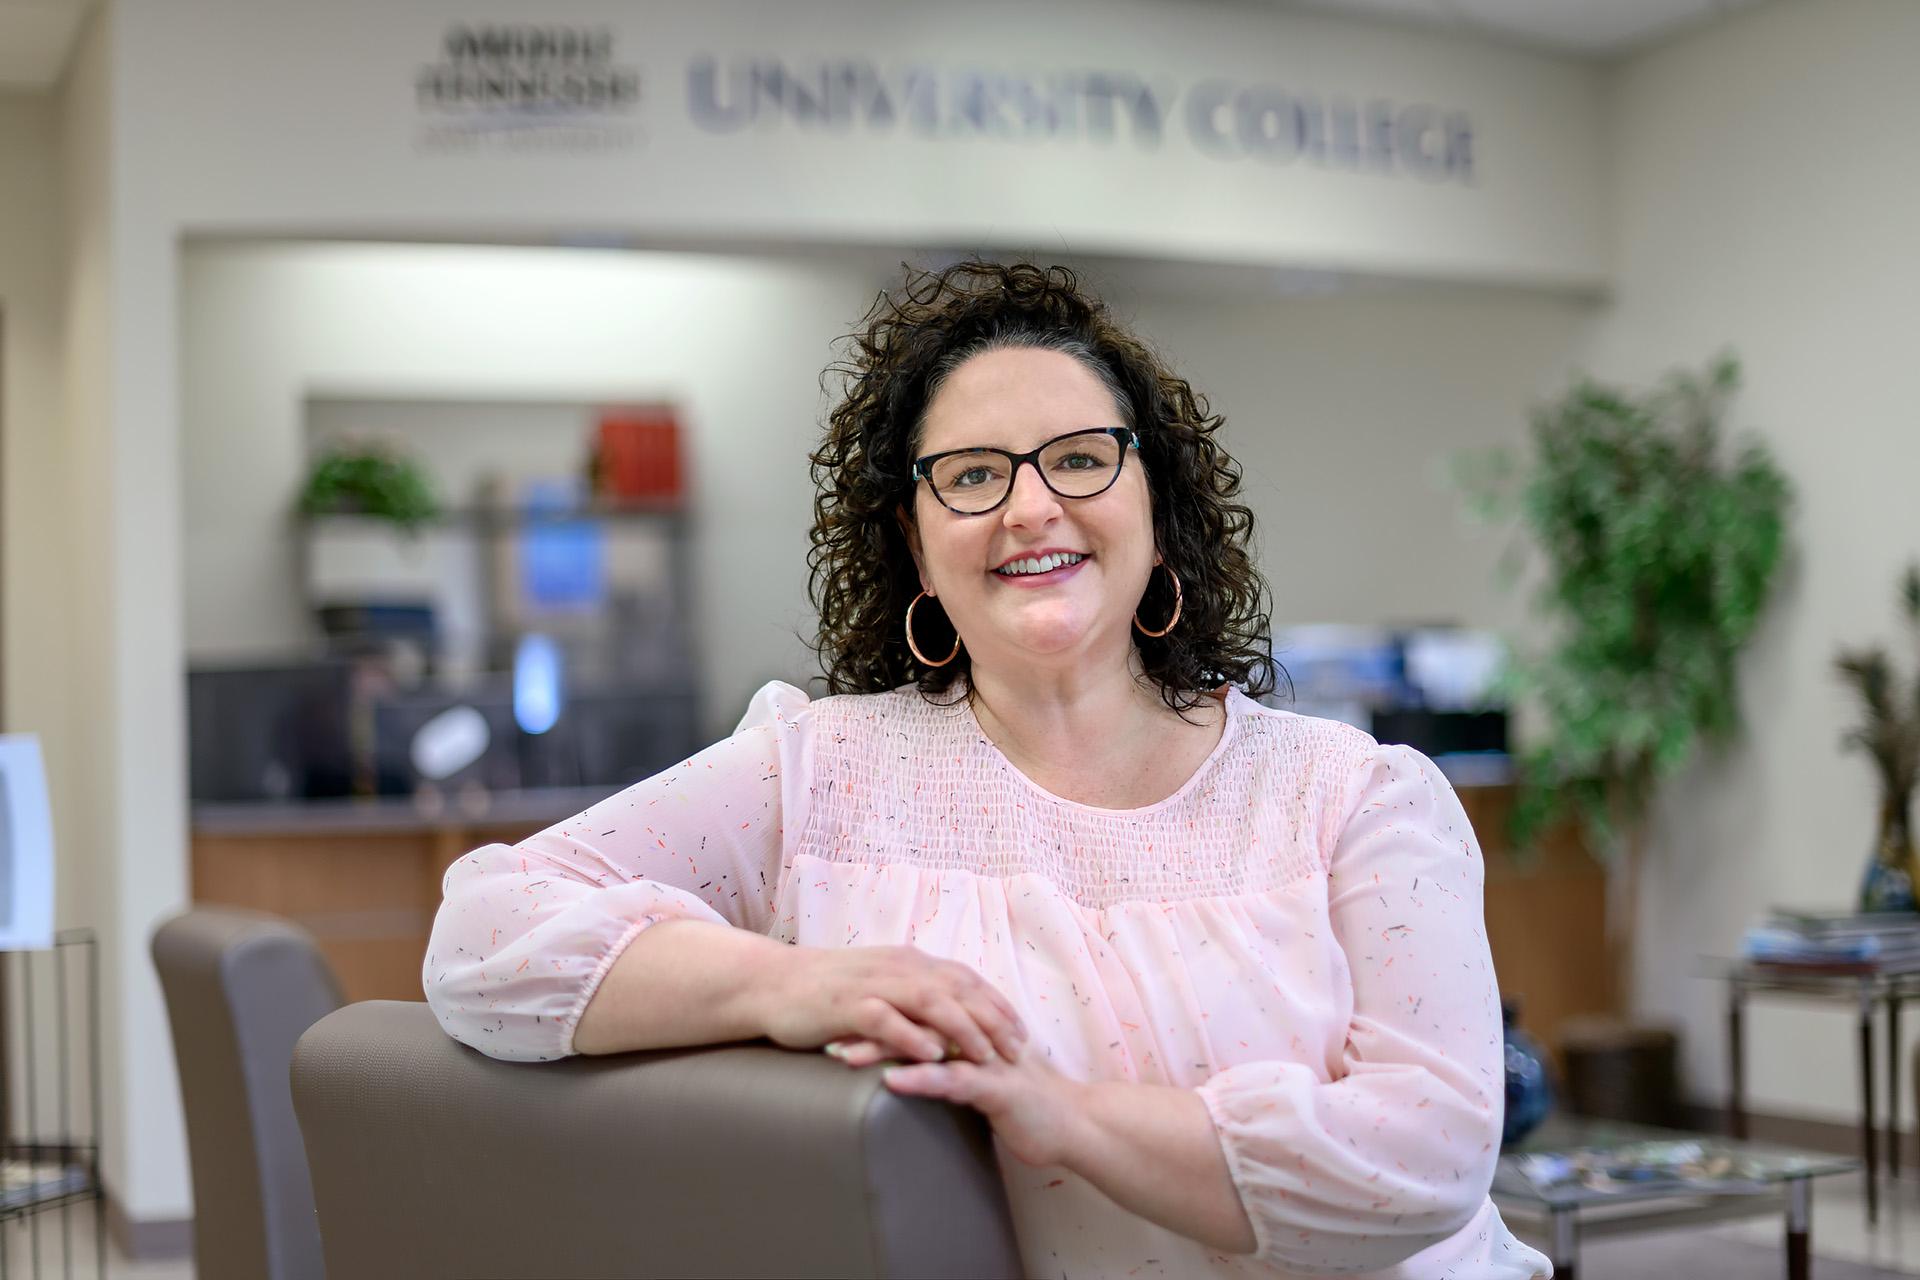 Tara Perrin, Instructional Designer, University College staff profile. (Photo: J. Intintoli)